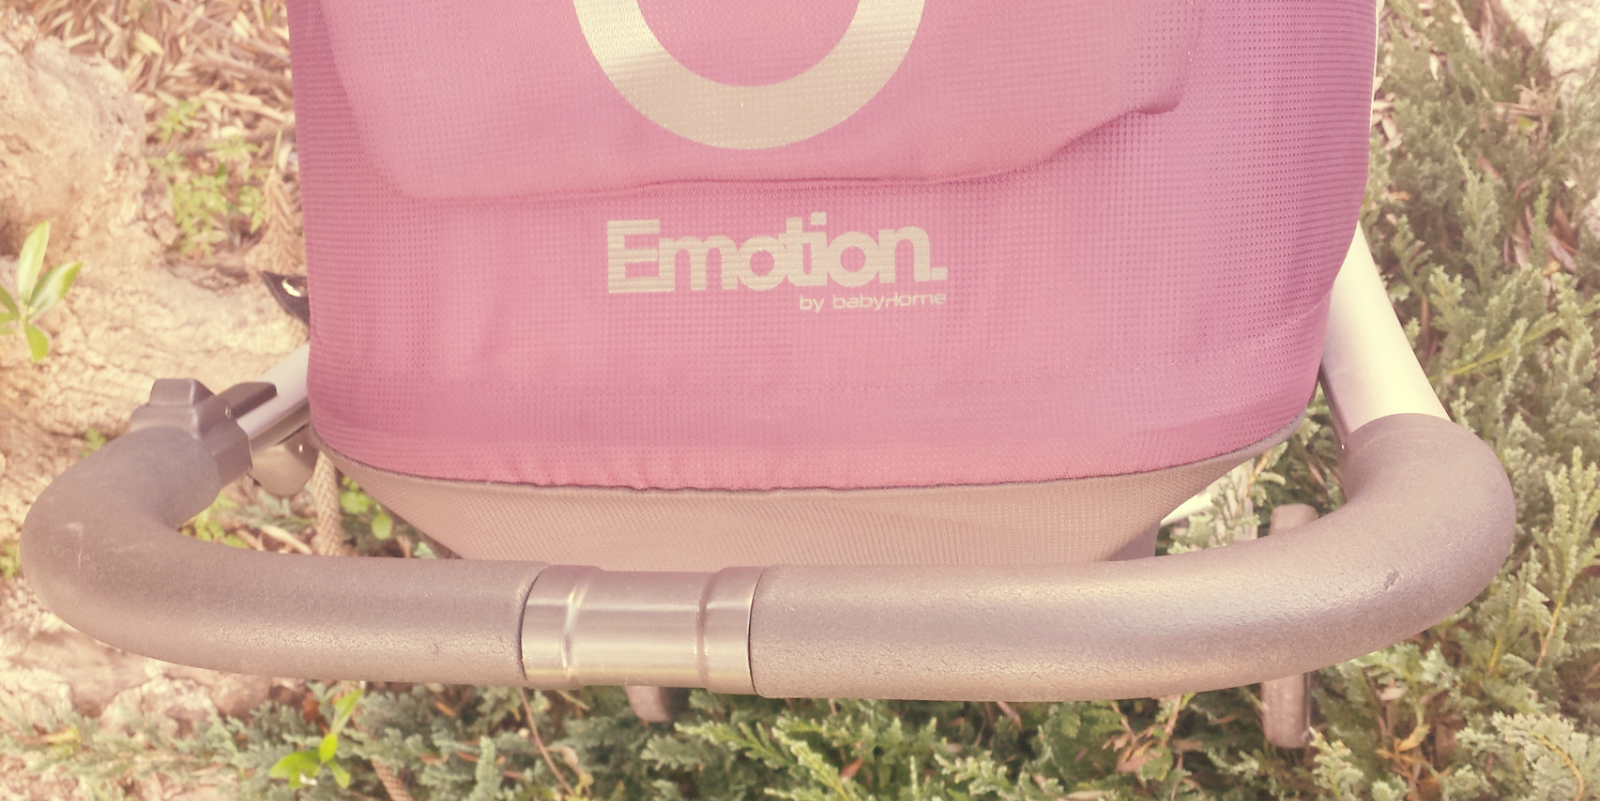 colchoneta emotion babyhome